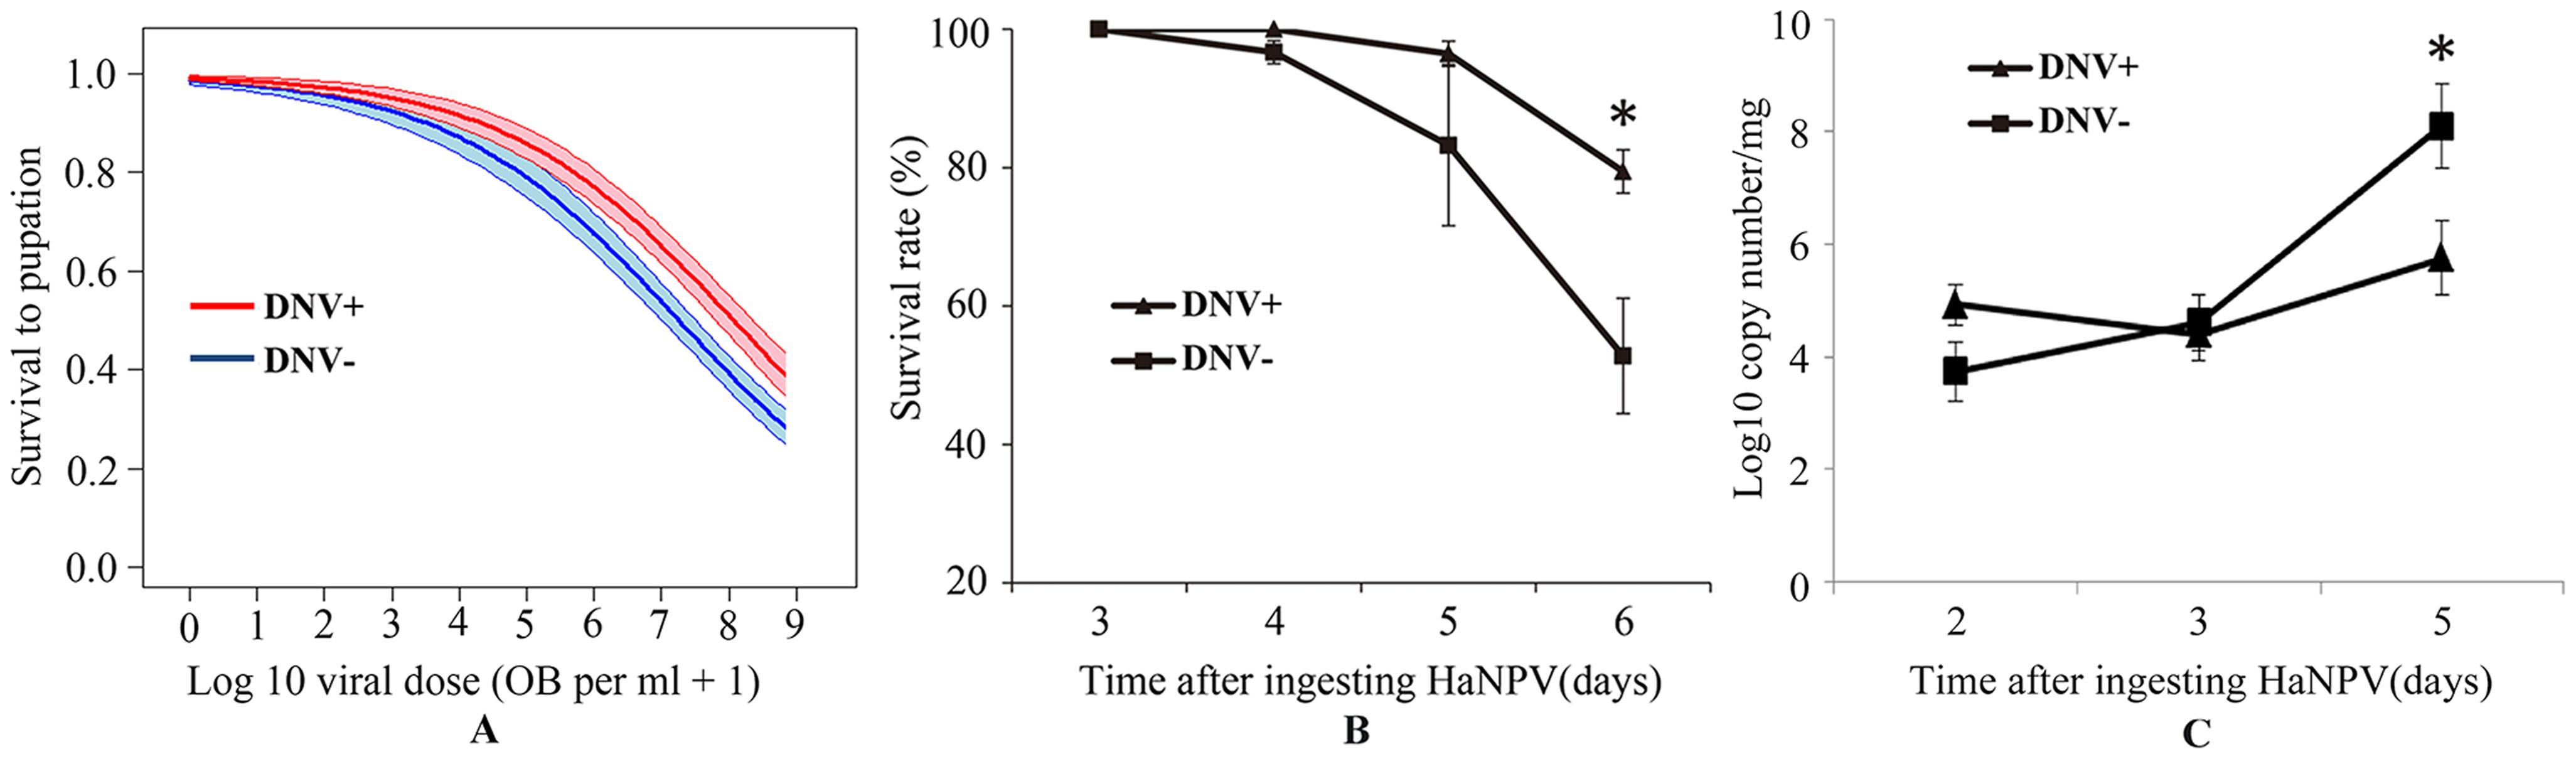 Relationship between the baculovirus HaNPV and the densovirus HaDNV-1 in cotton bollworm larvae.